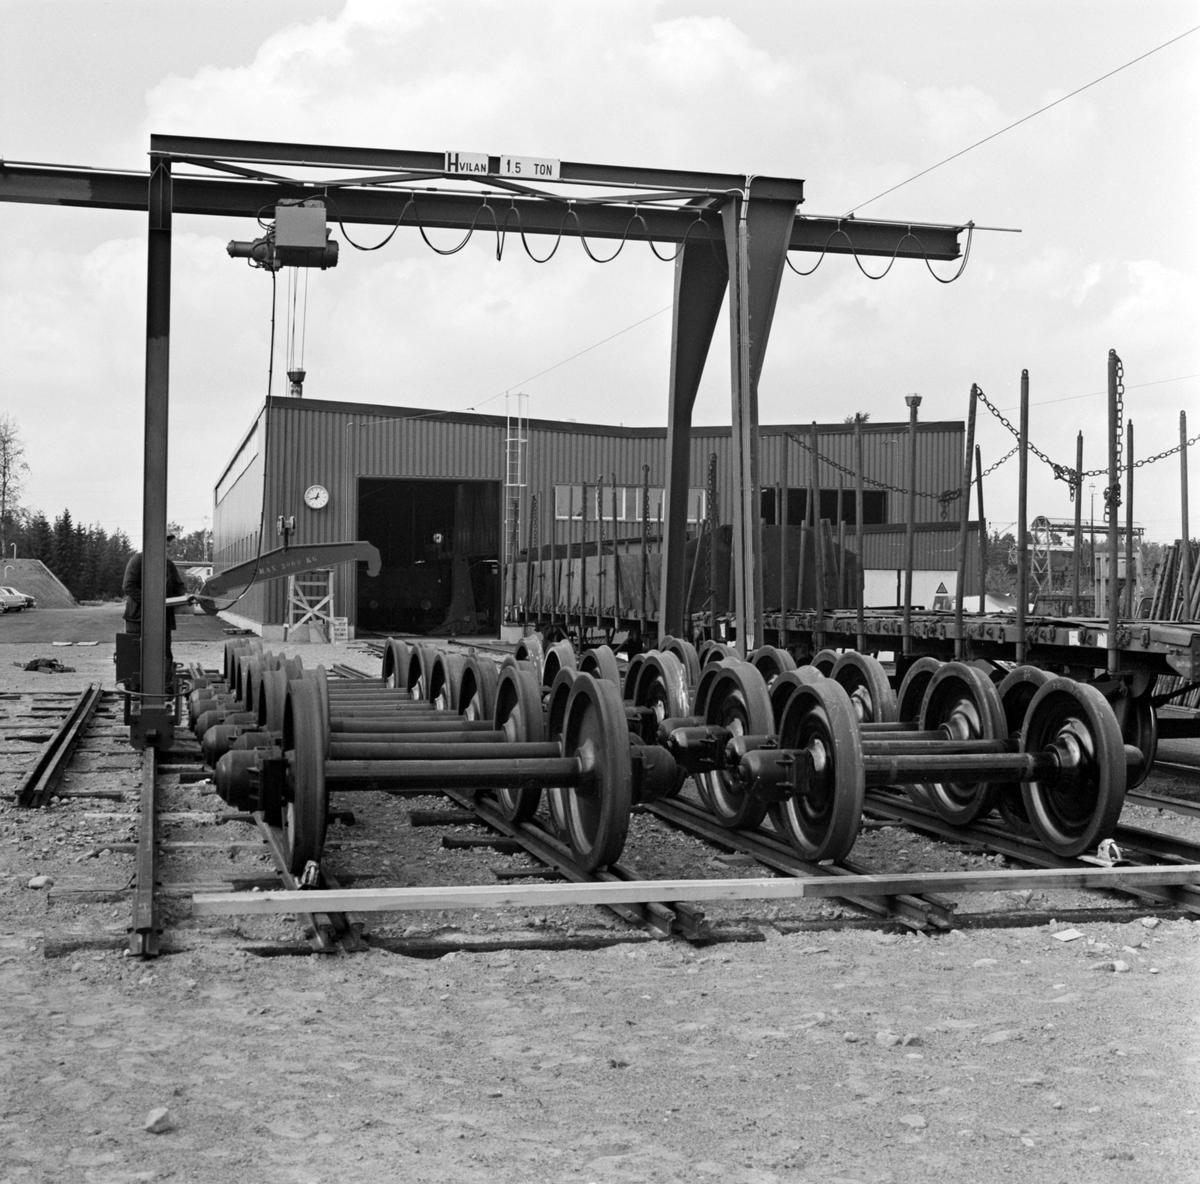 Ny vagnverkstad, Nässjö